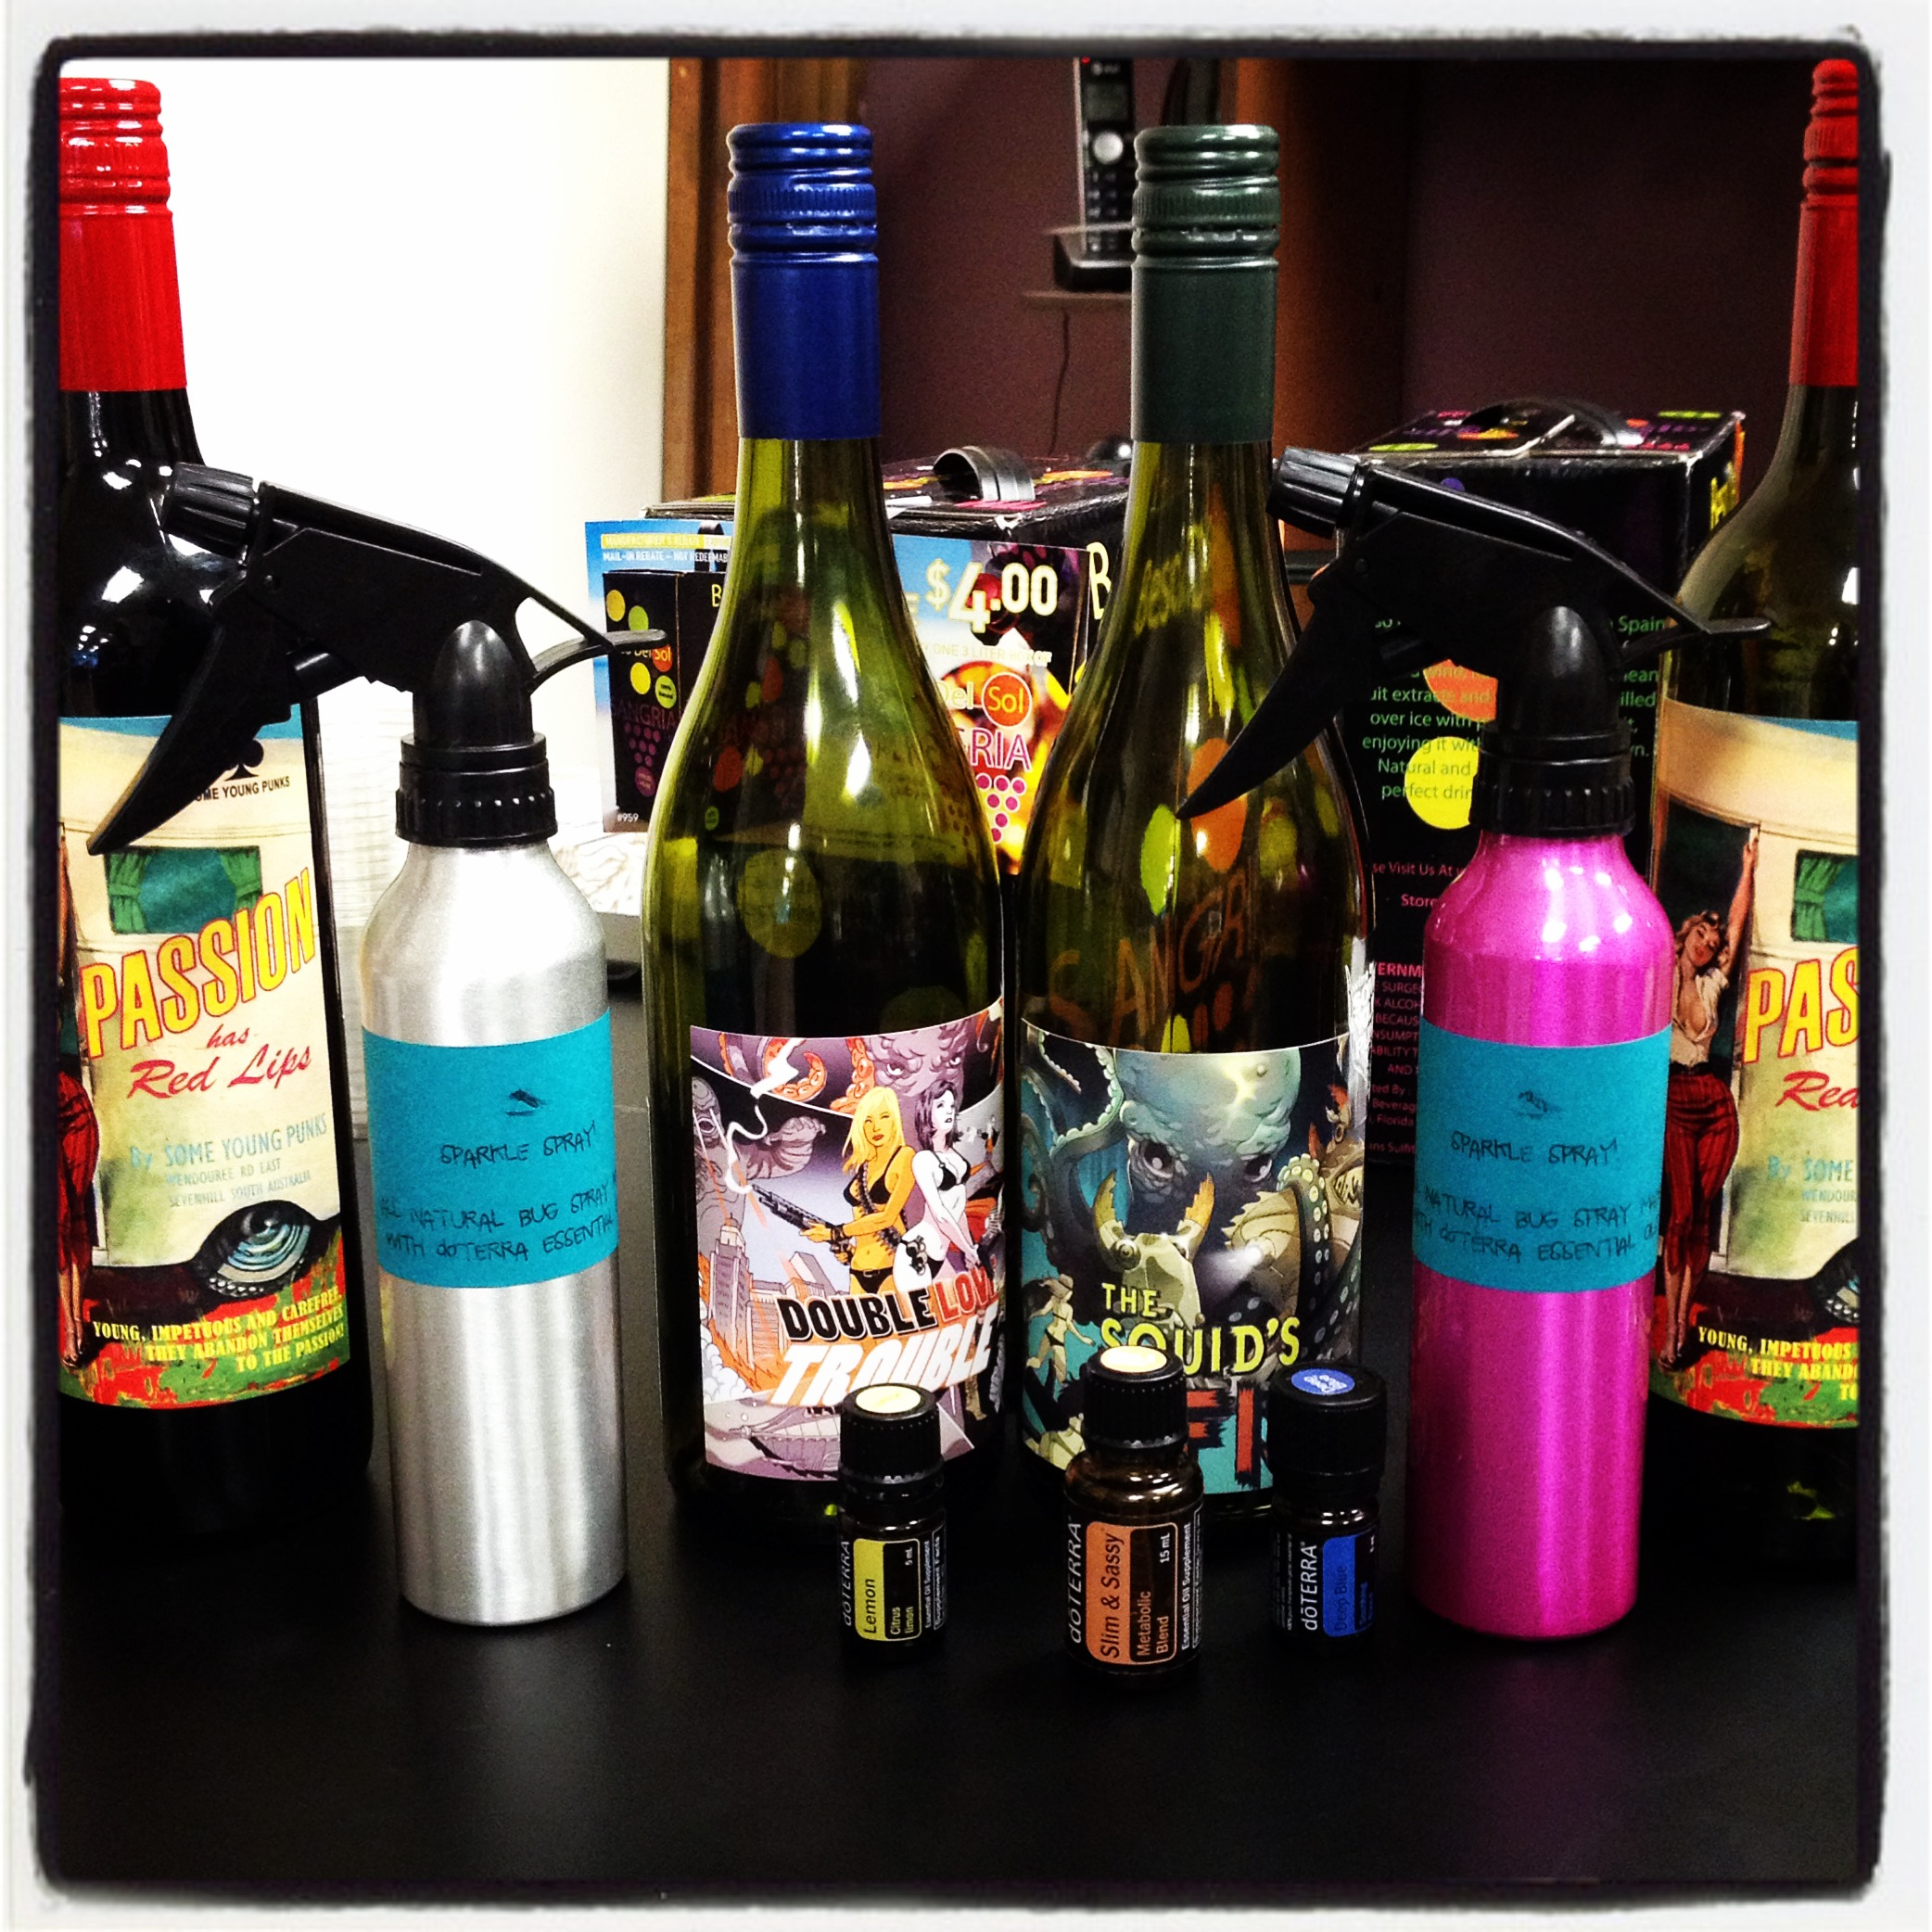 Sparkle spray, wine, and my favorite, doTerra oils!